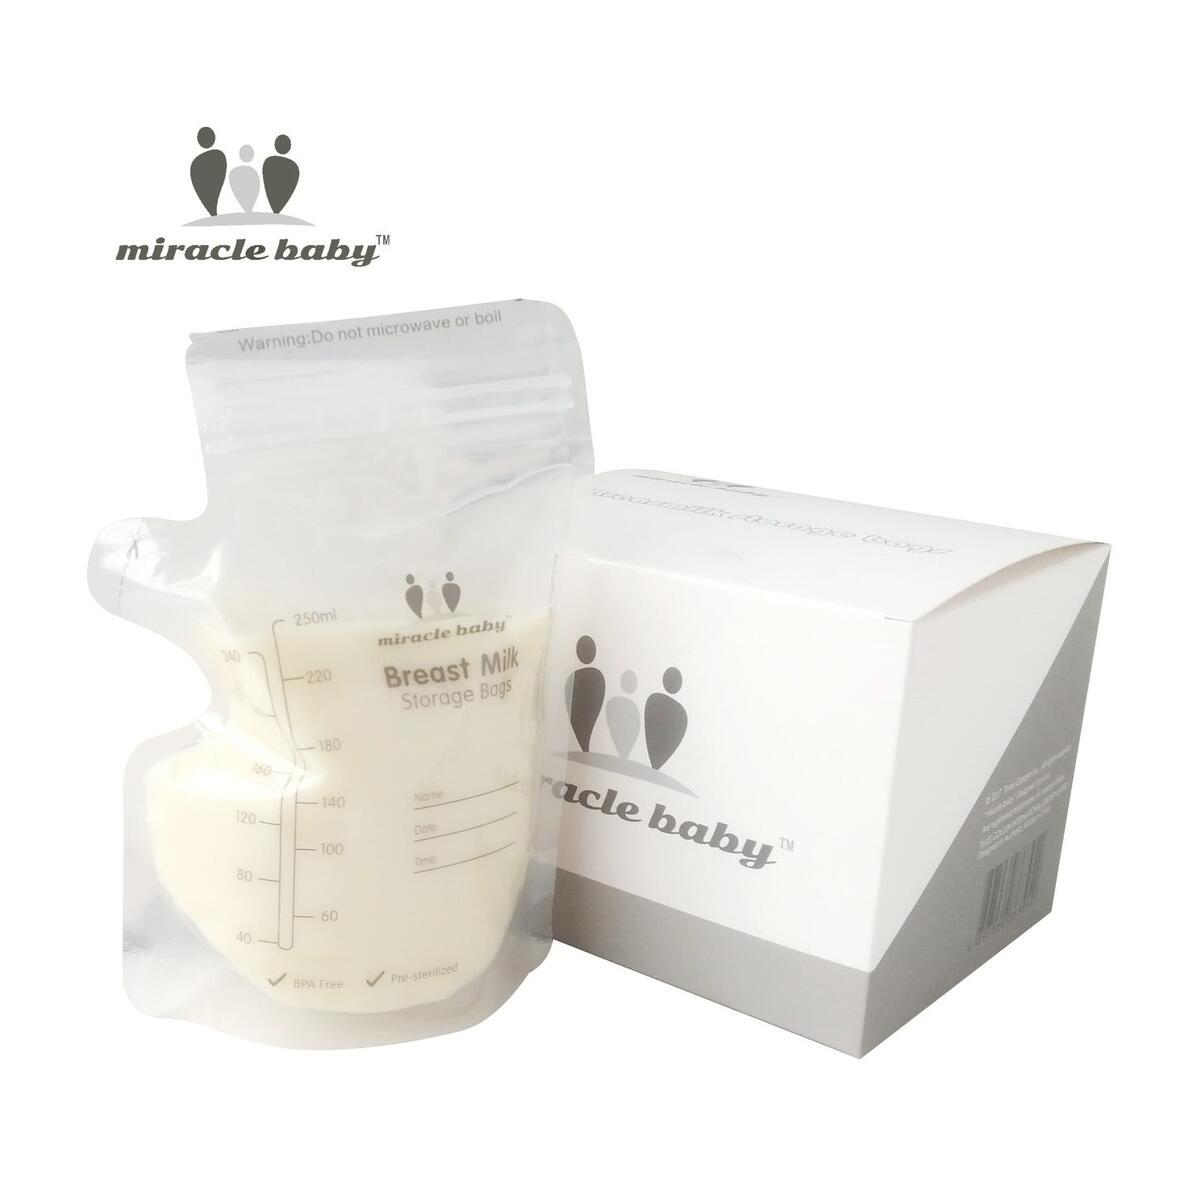 Milk Freezer Storage Bags Breast Milk Storage Bag Bpa Free Baby Safe Feeding Feeding Bag